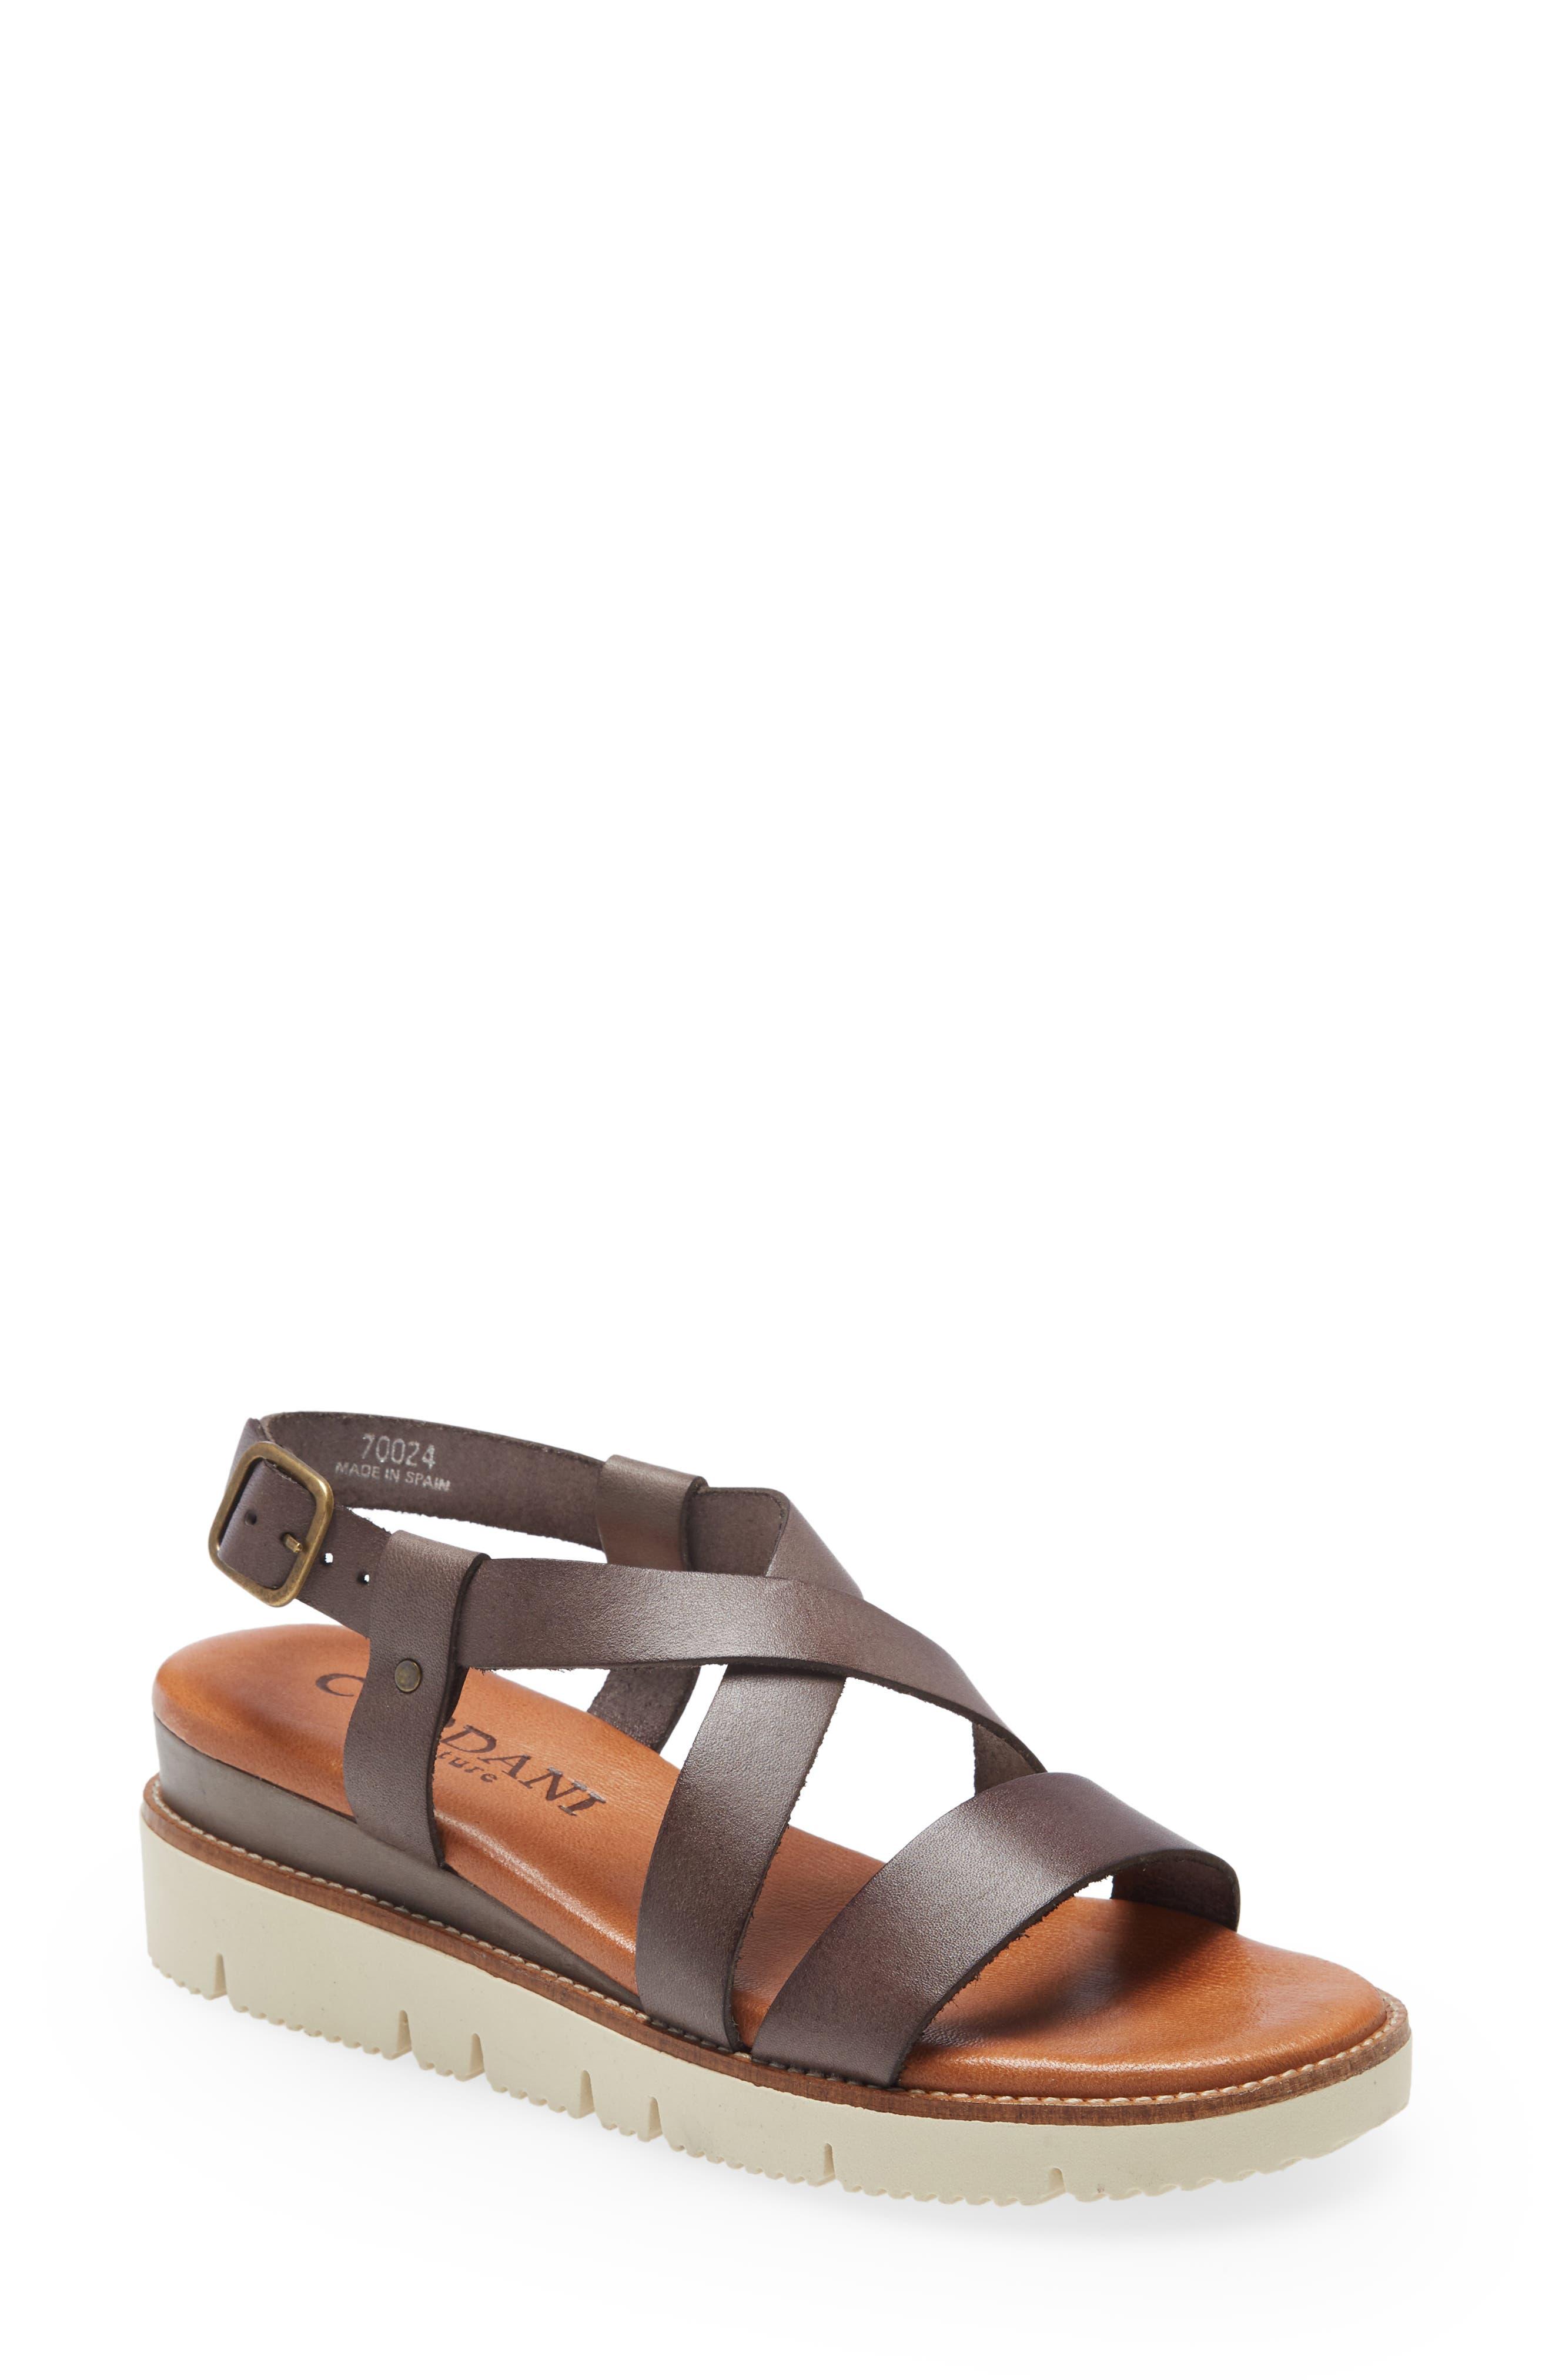 Skyla Strappy Wedge Sandal